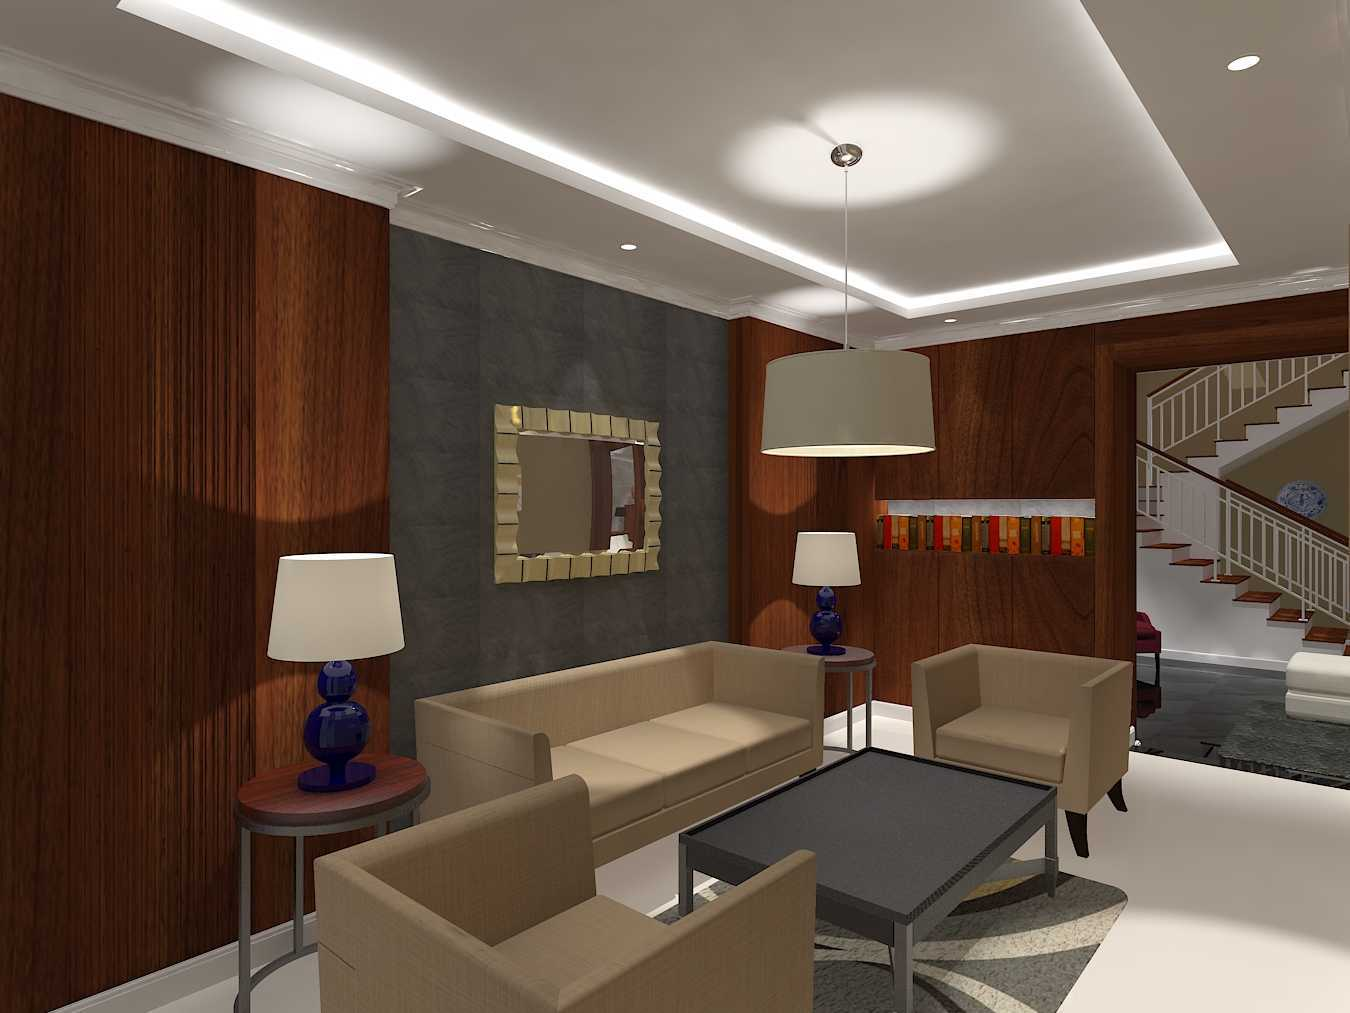 Emil Yusman (E'architect) Tebet Barat Jl. Tebet Barat Viii, Tebet Bar., Tebet, Kota Jakarta Selatan, Daerah Khusus Ibukota Jakarta 12810, Indonesia South Jakarta Guest-Room  20197